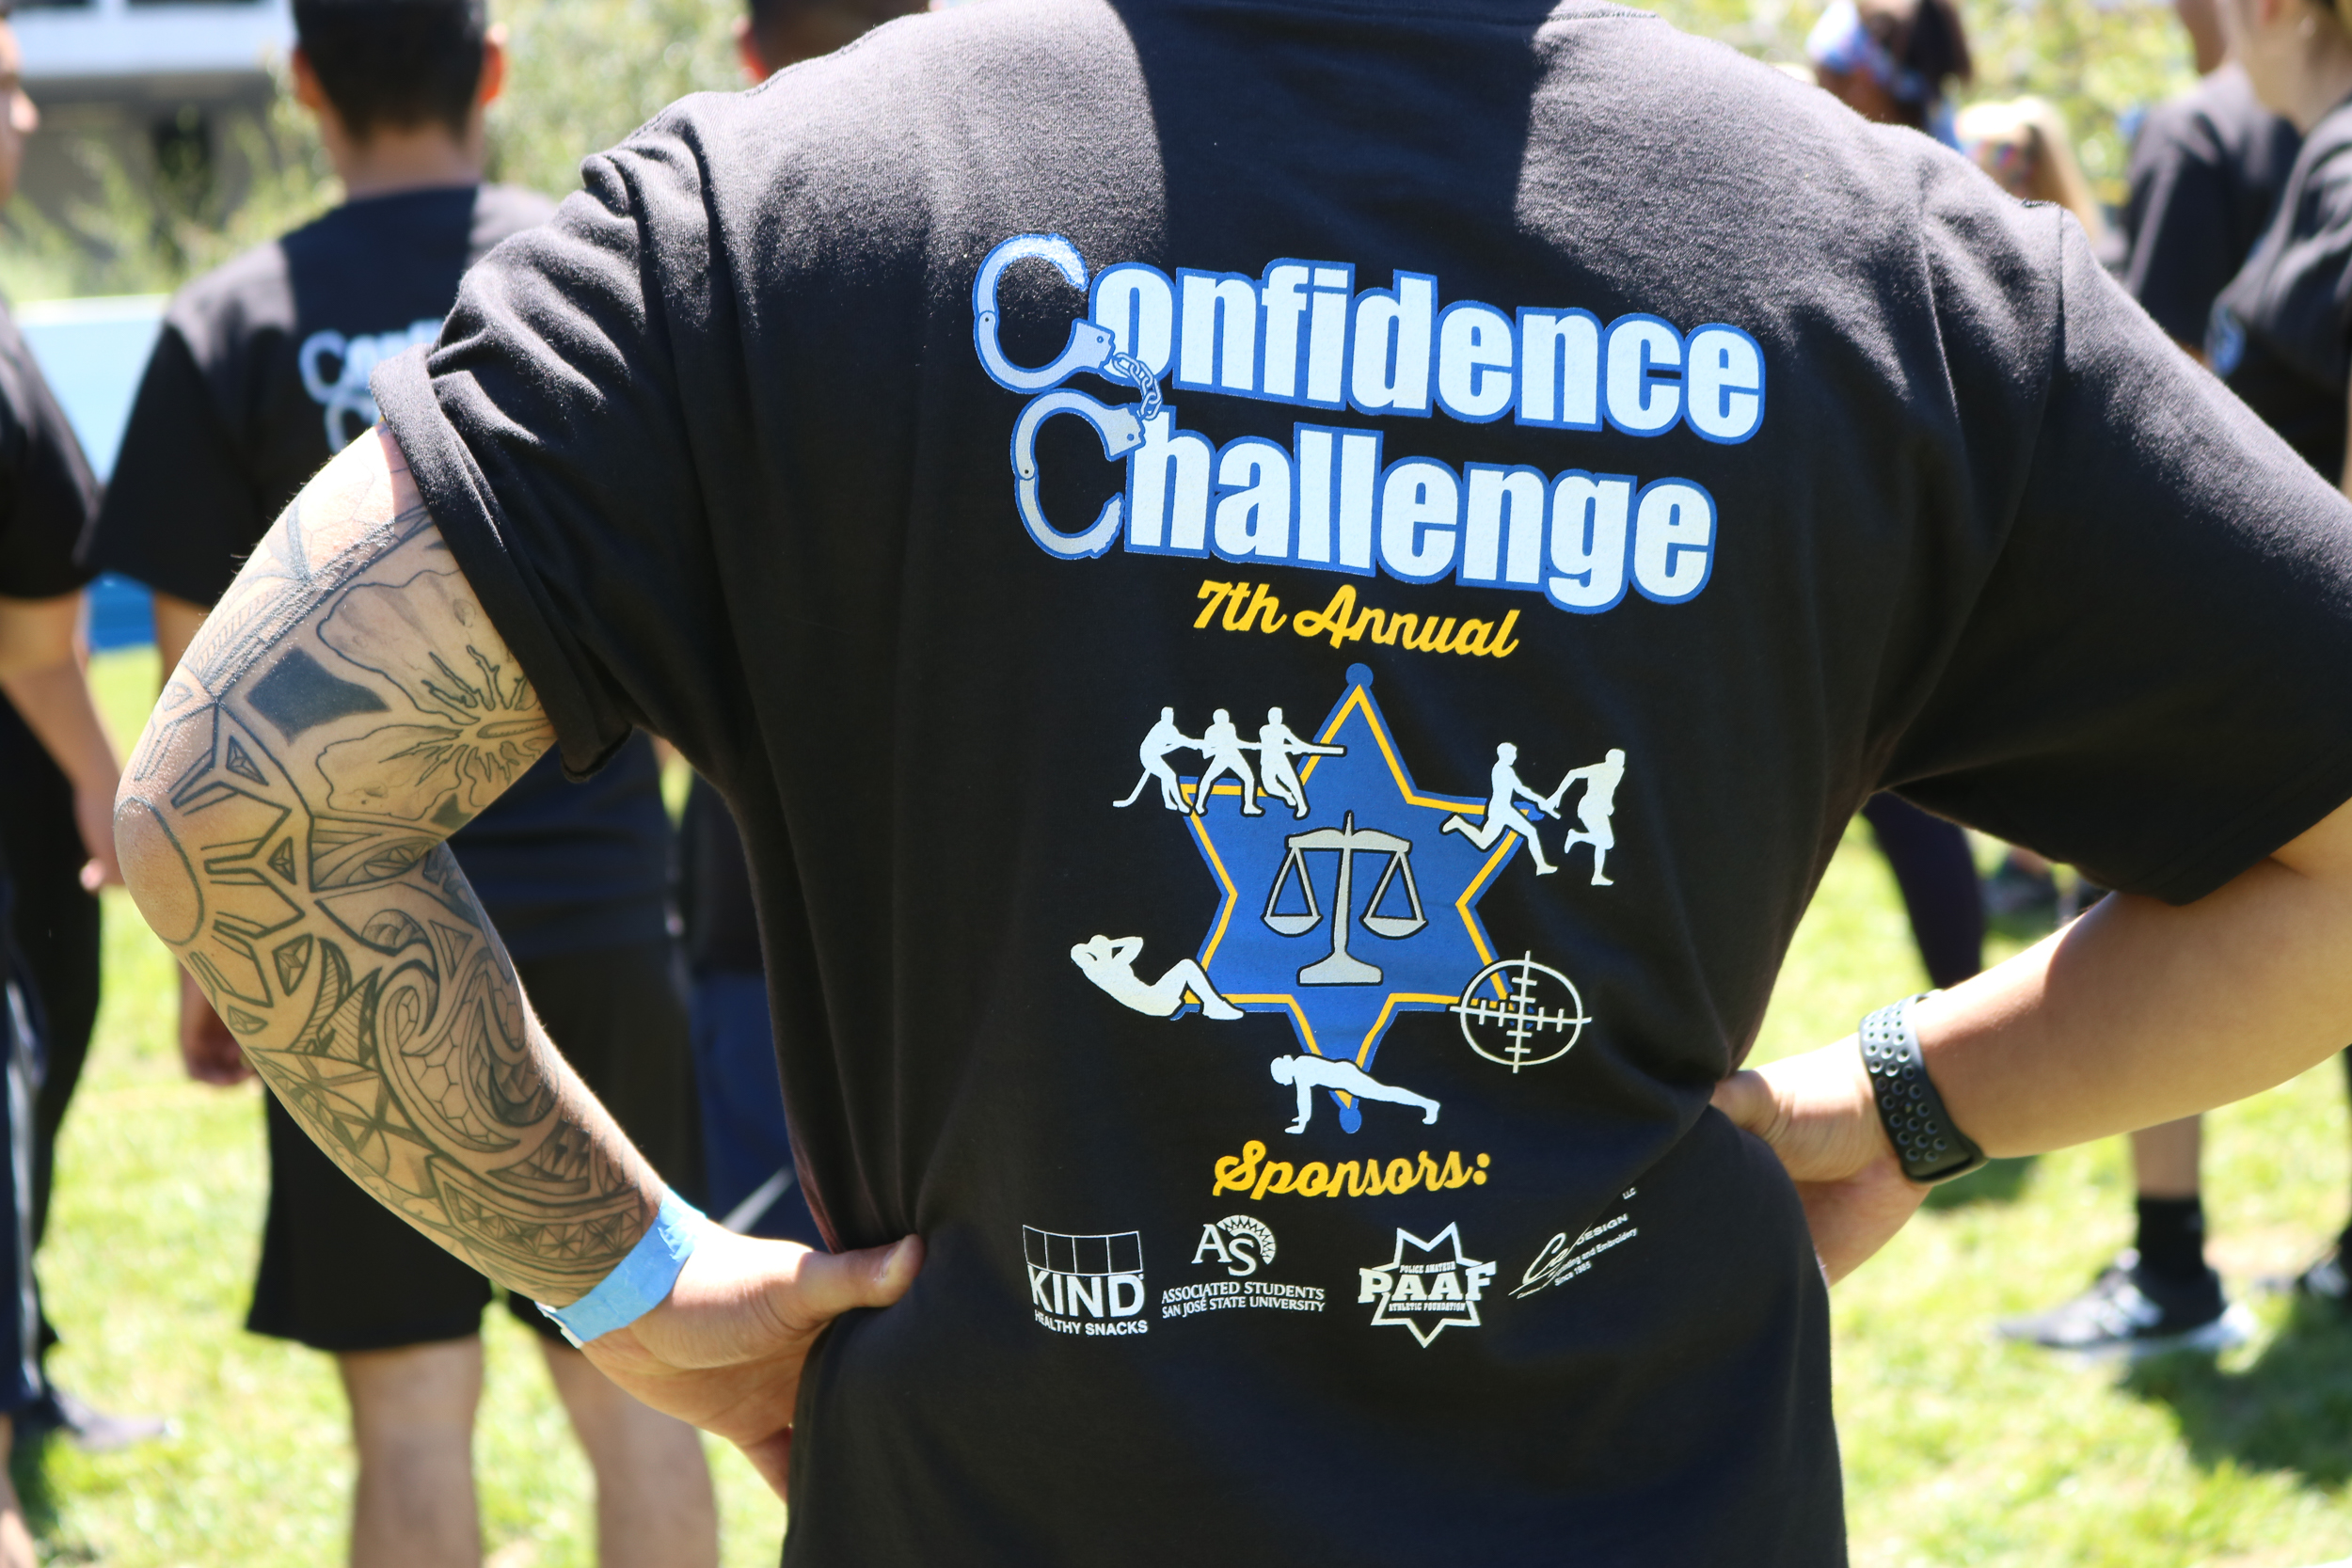 042817_Confidence_Challenge_Kameda-1.jpg